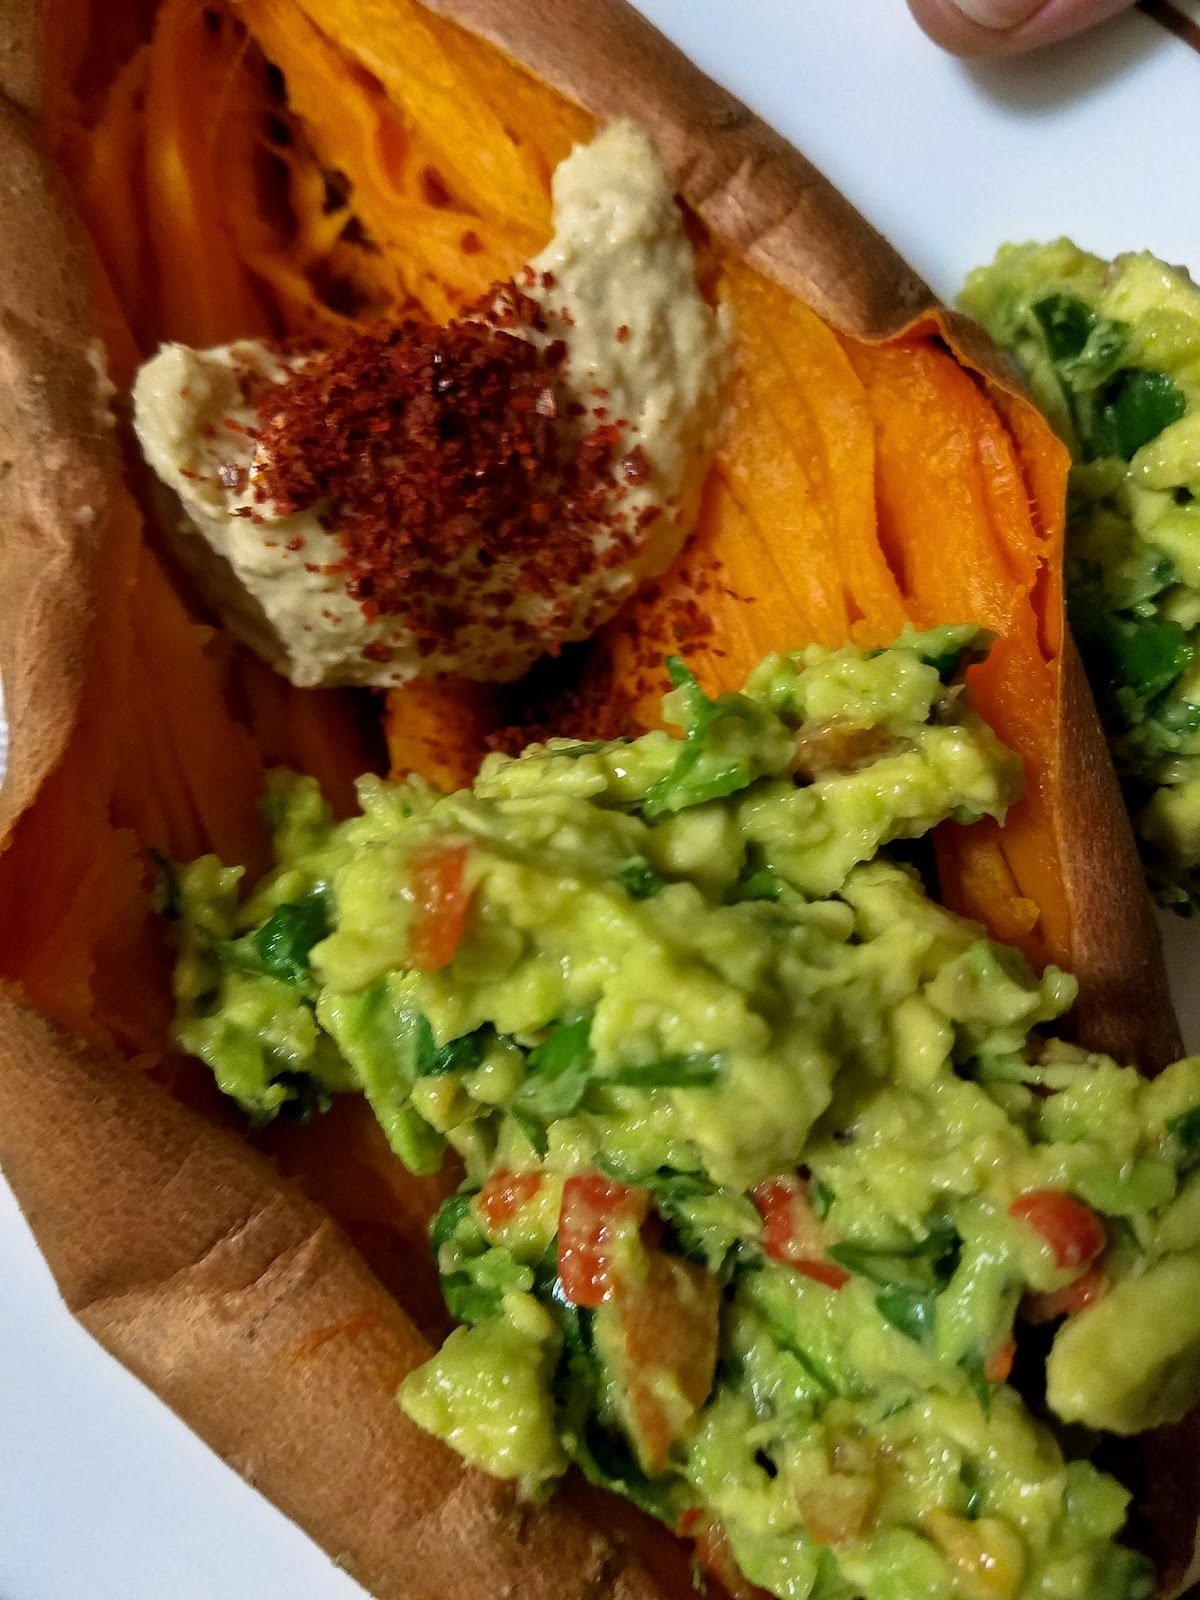 How To Make Guacamole-Stuffed Sweet Potatoes